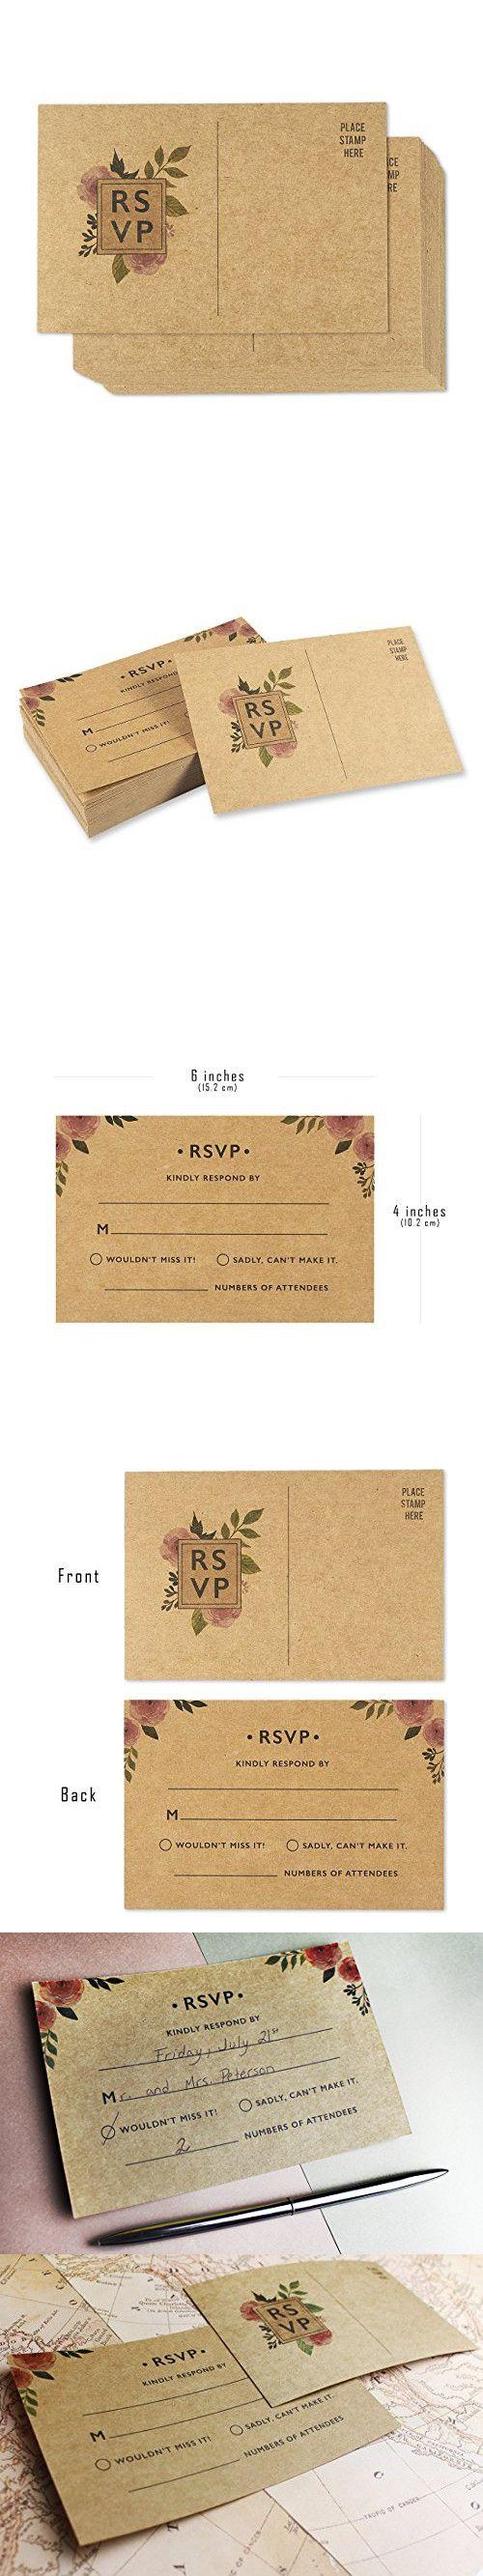 50 pack rsvp postcards kraft blank response card wedding return